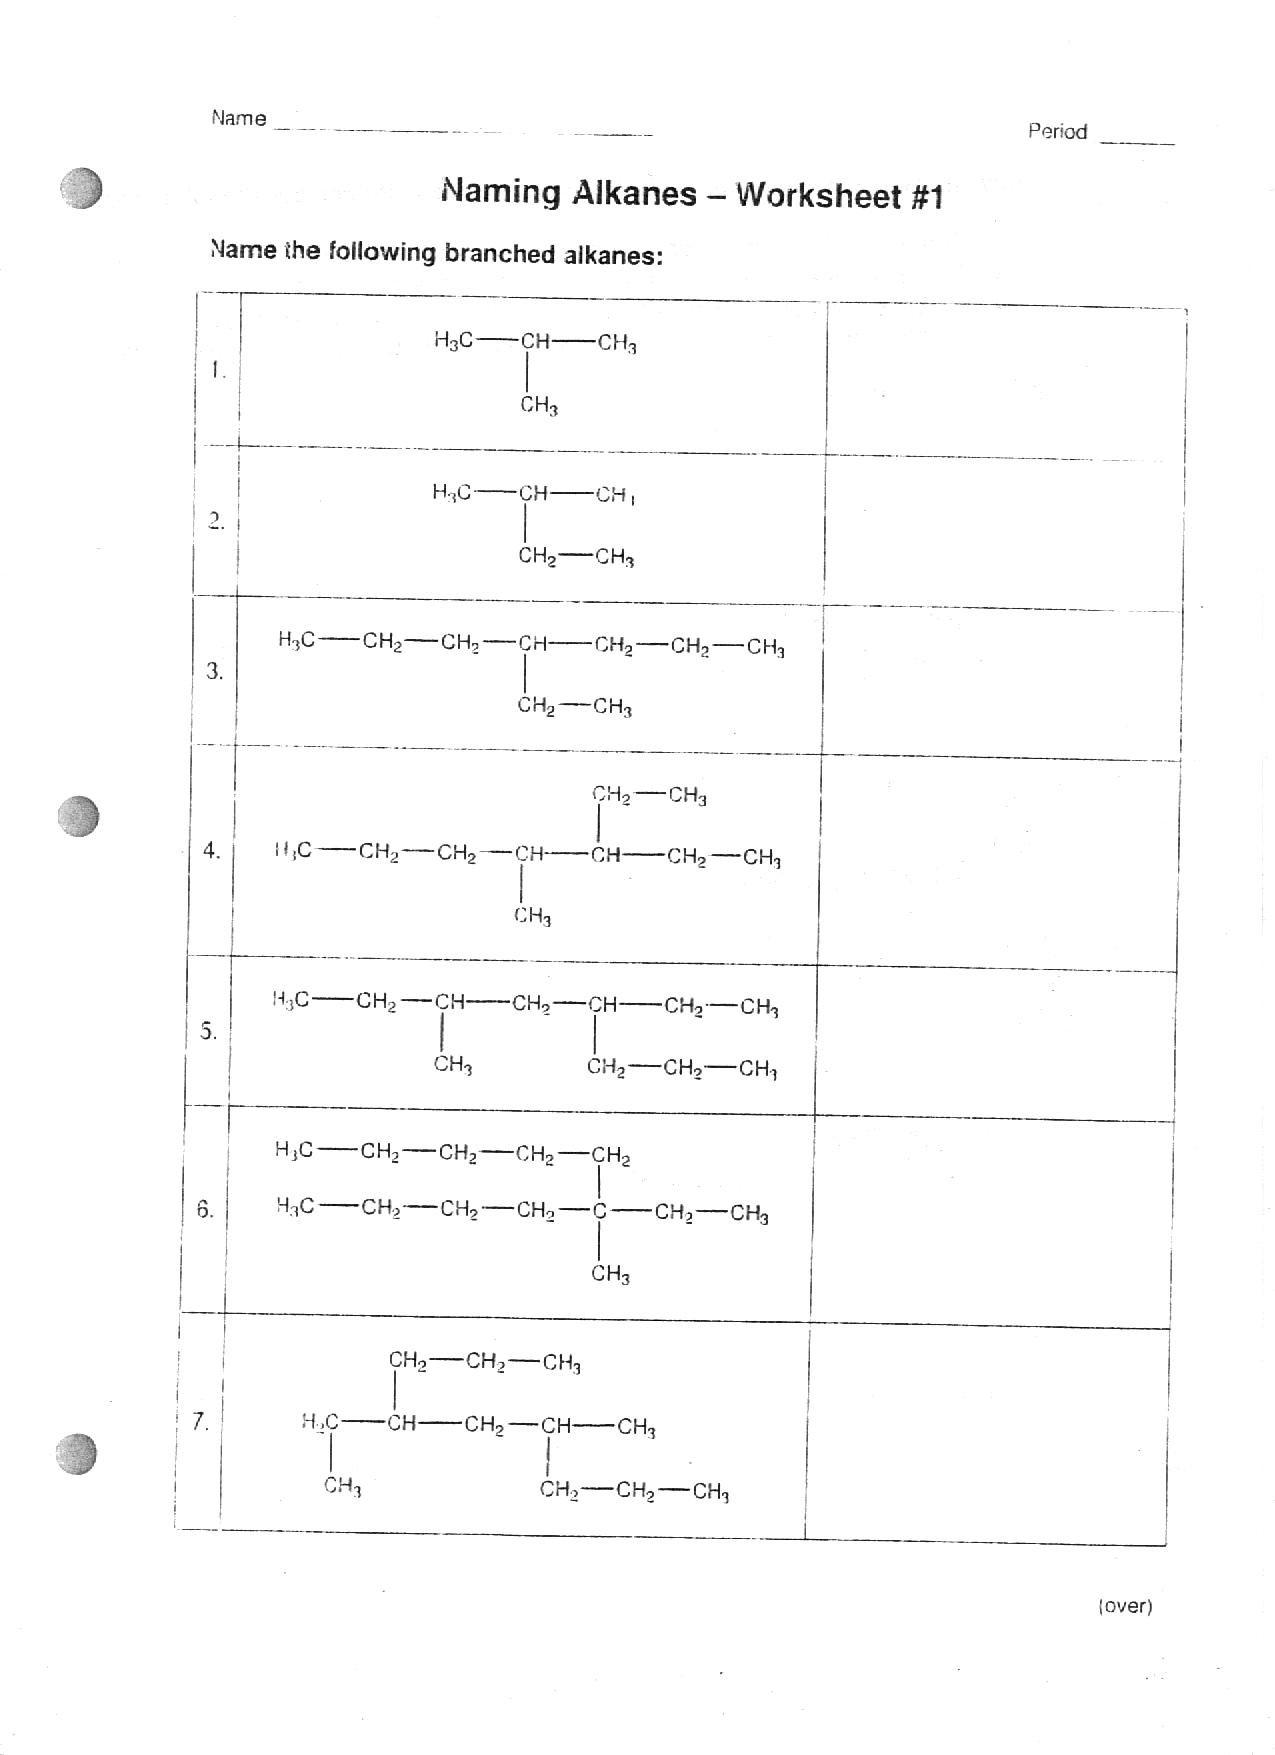 Naming Alkanes Worksheet The Best Worksheets Image Collection